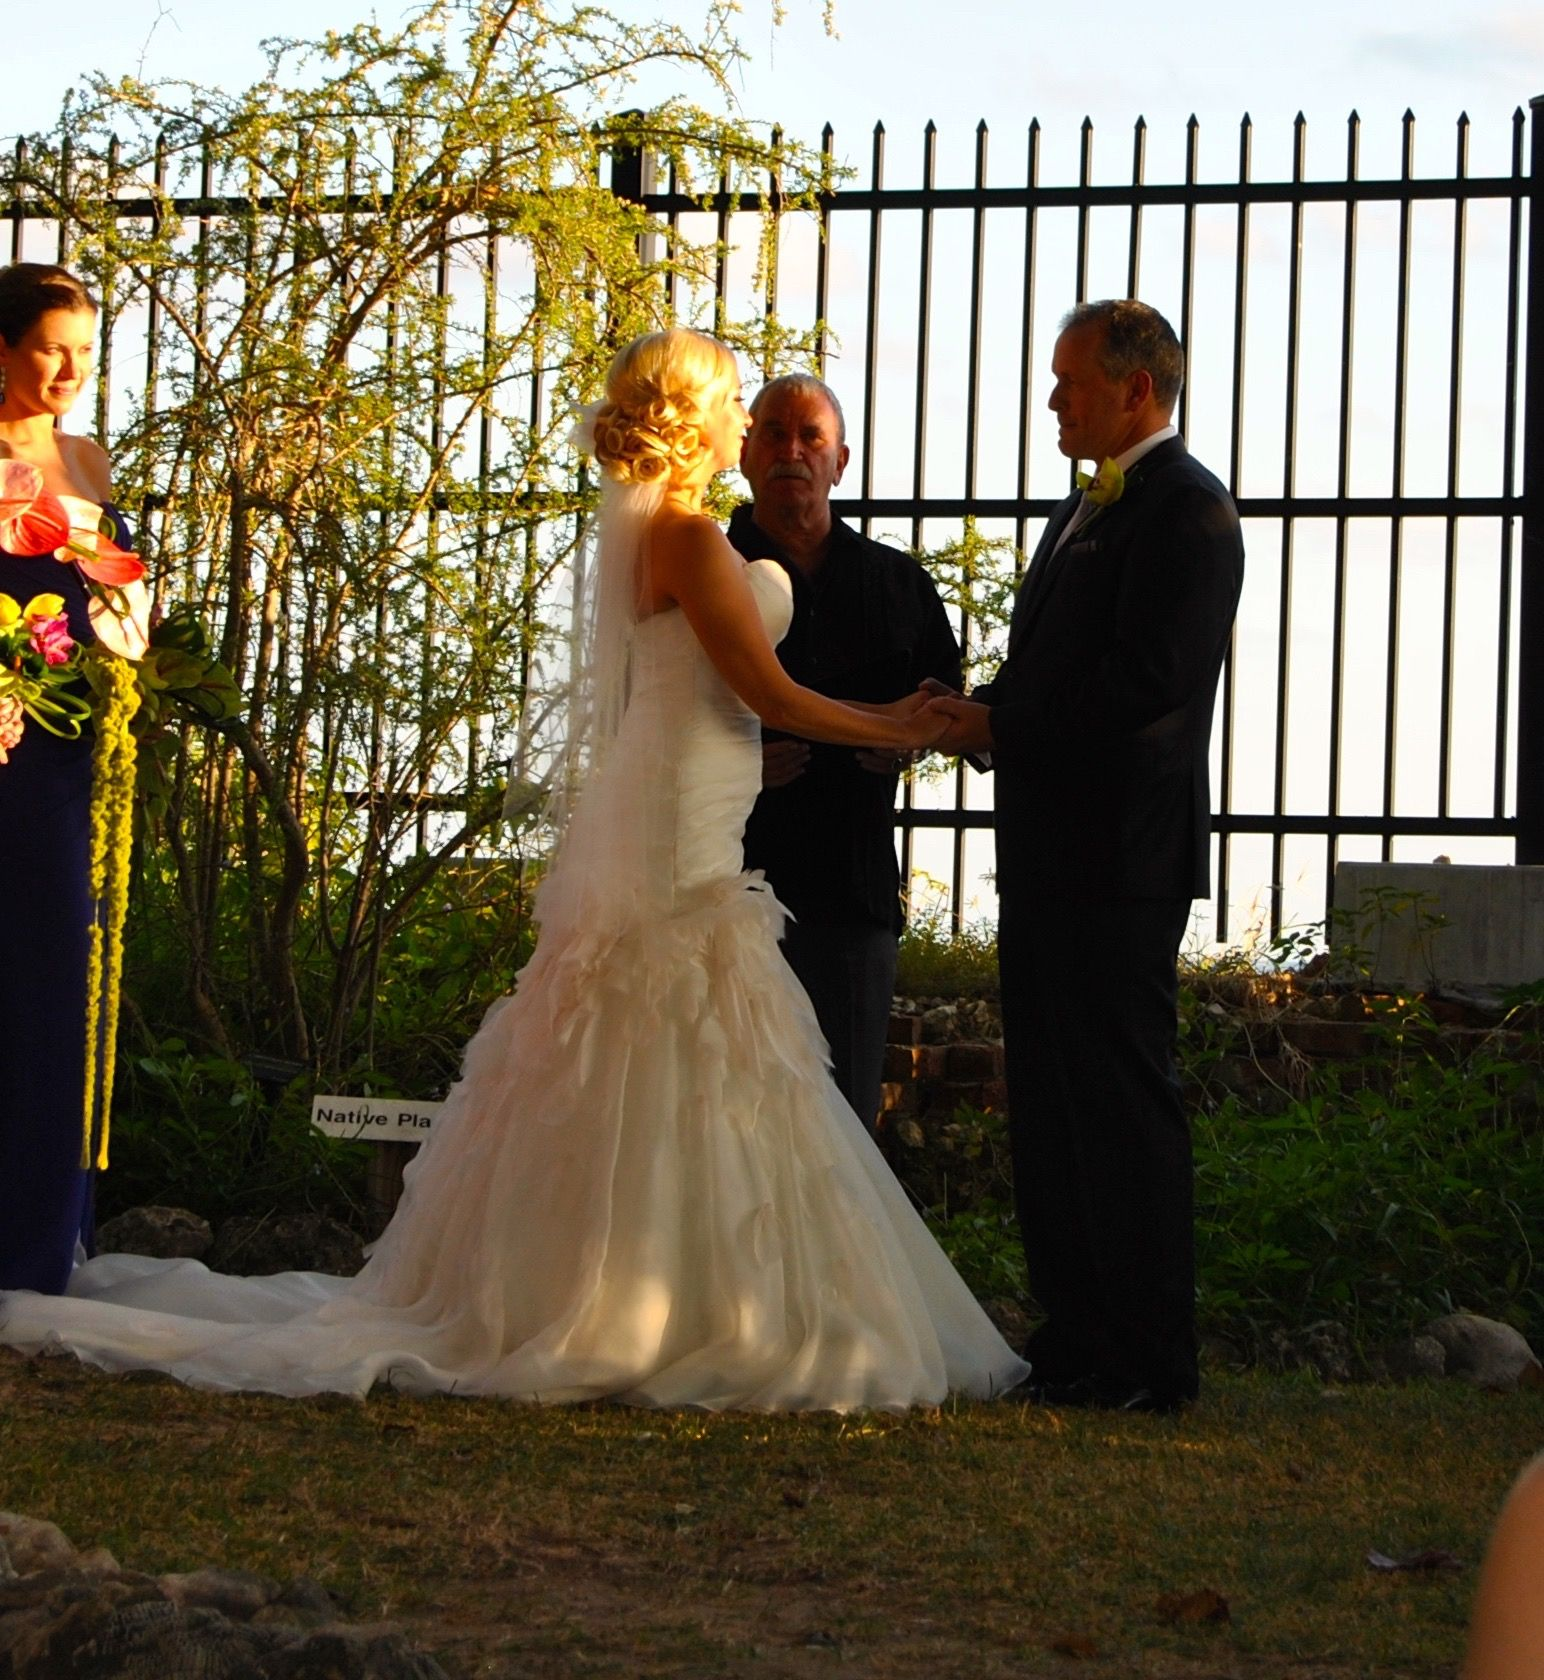 Key West Wedding Ideas: Key West Martello Tower/Botanical Gardens Wedding